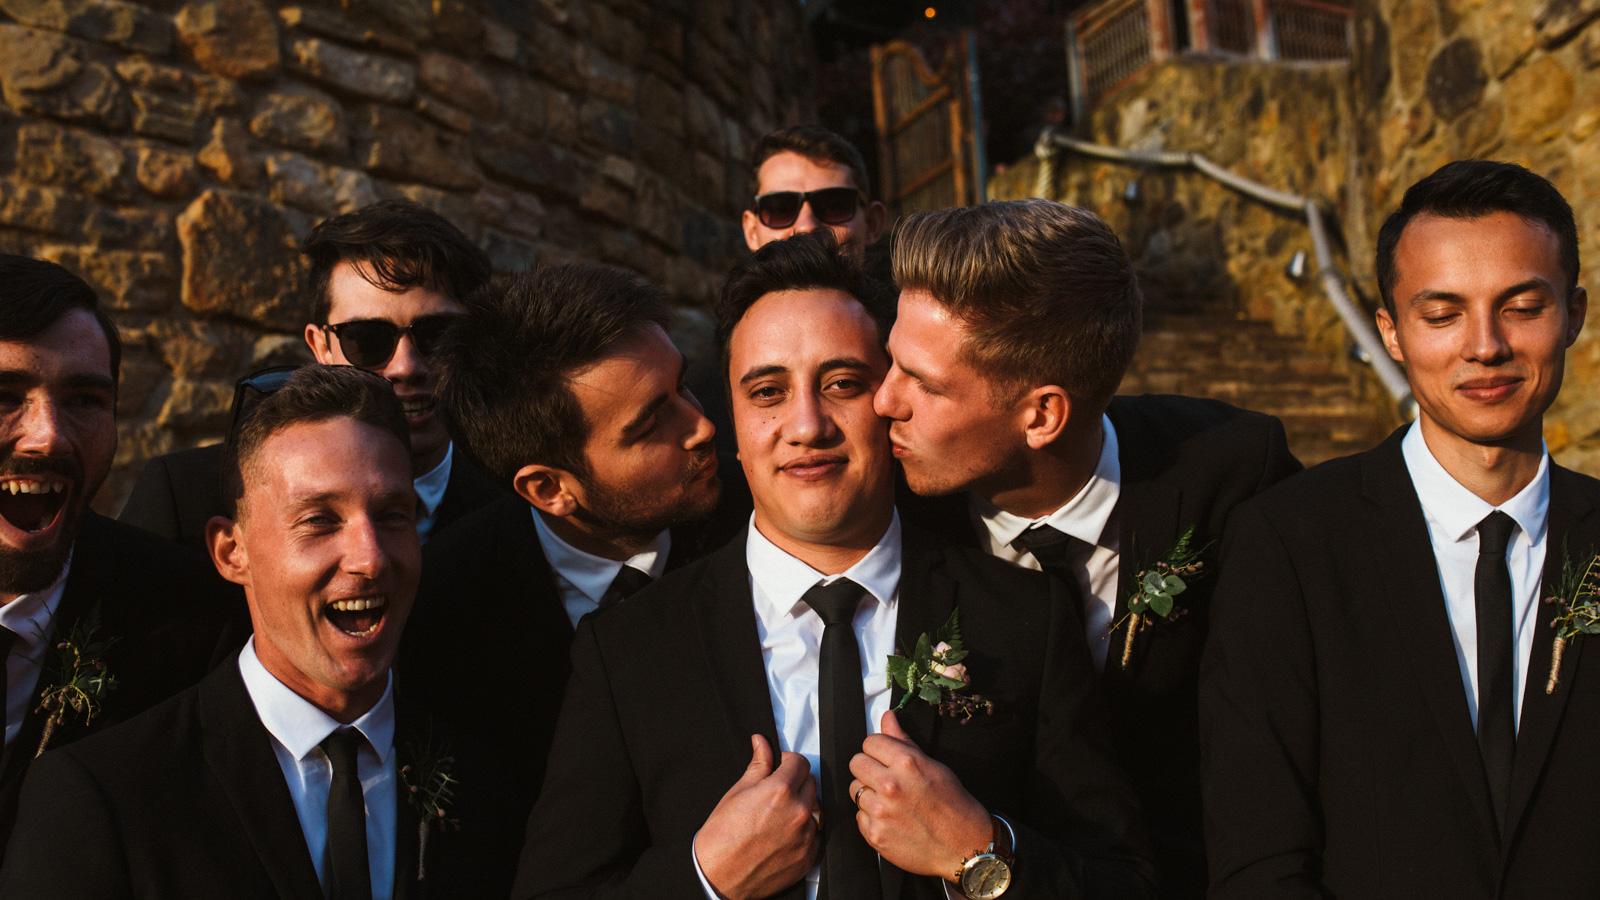 Melbourne Wedding Photography-Dean Raphael-25.jpg